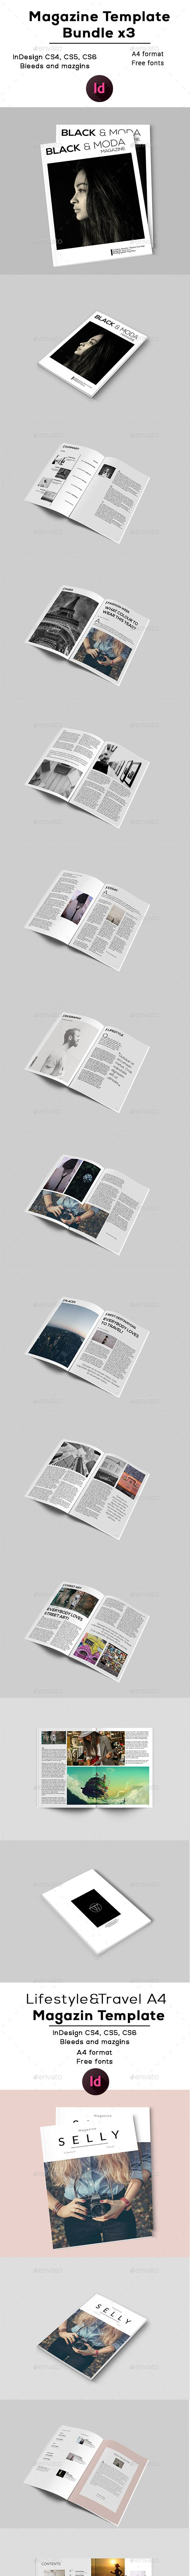 A4 Magazines Templates x3 - Magazines Print Templates